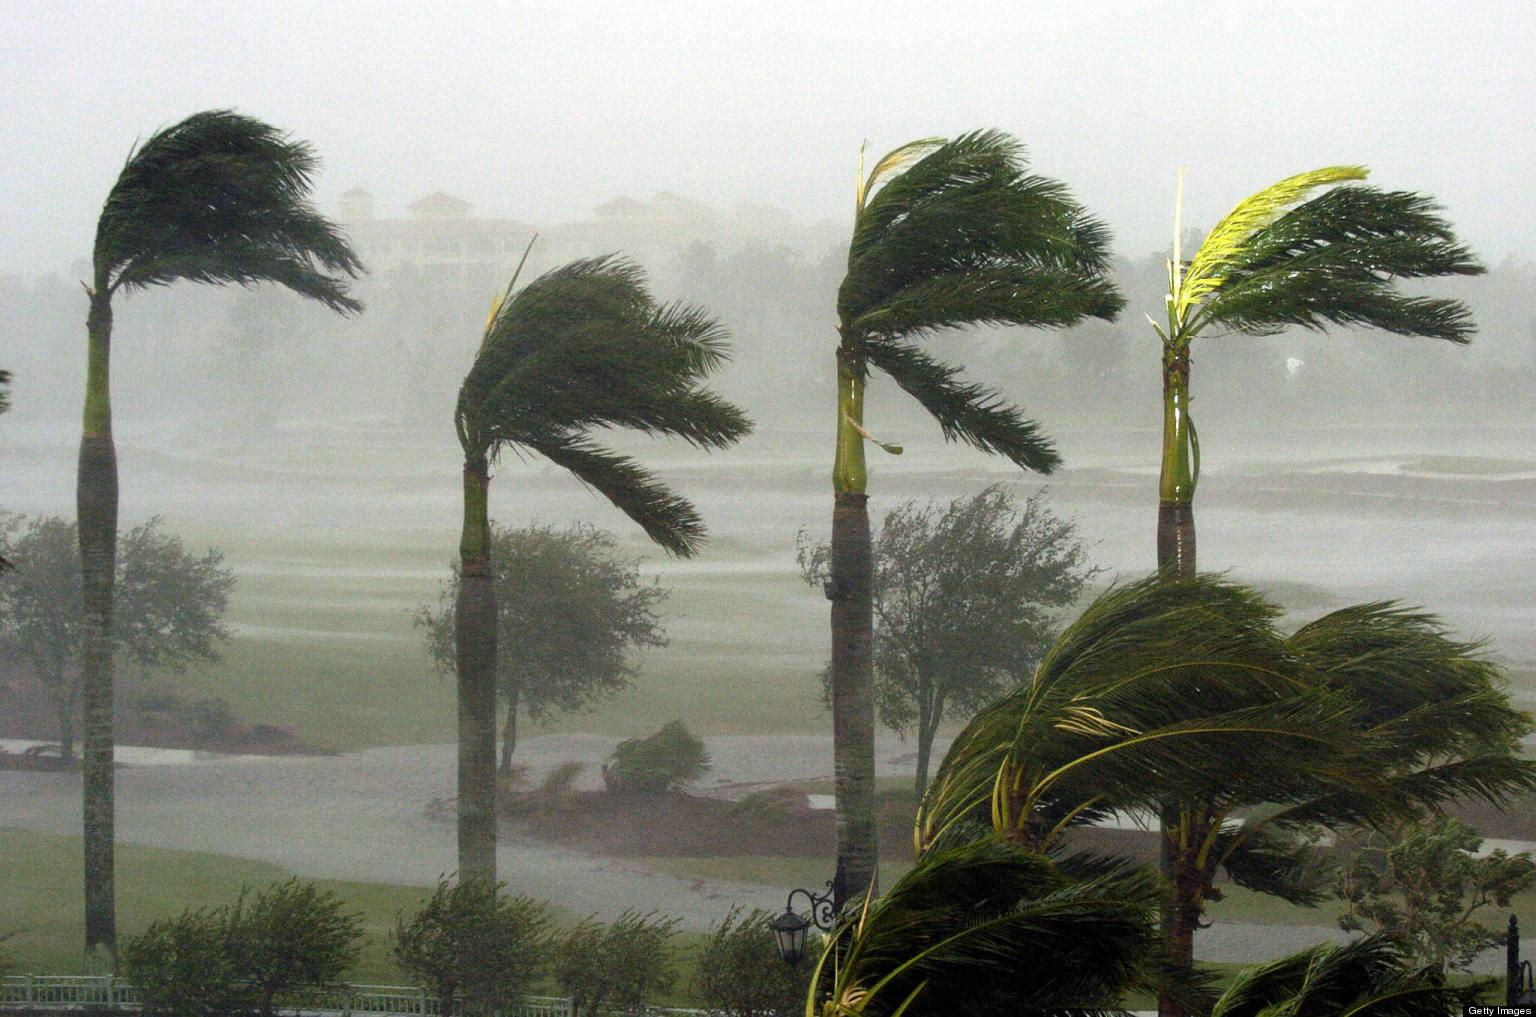 2013 Hurricane Forecast: 9 Hurricanes, 18 Named Storms | HuffPost